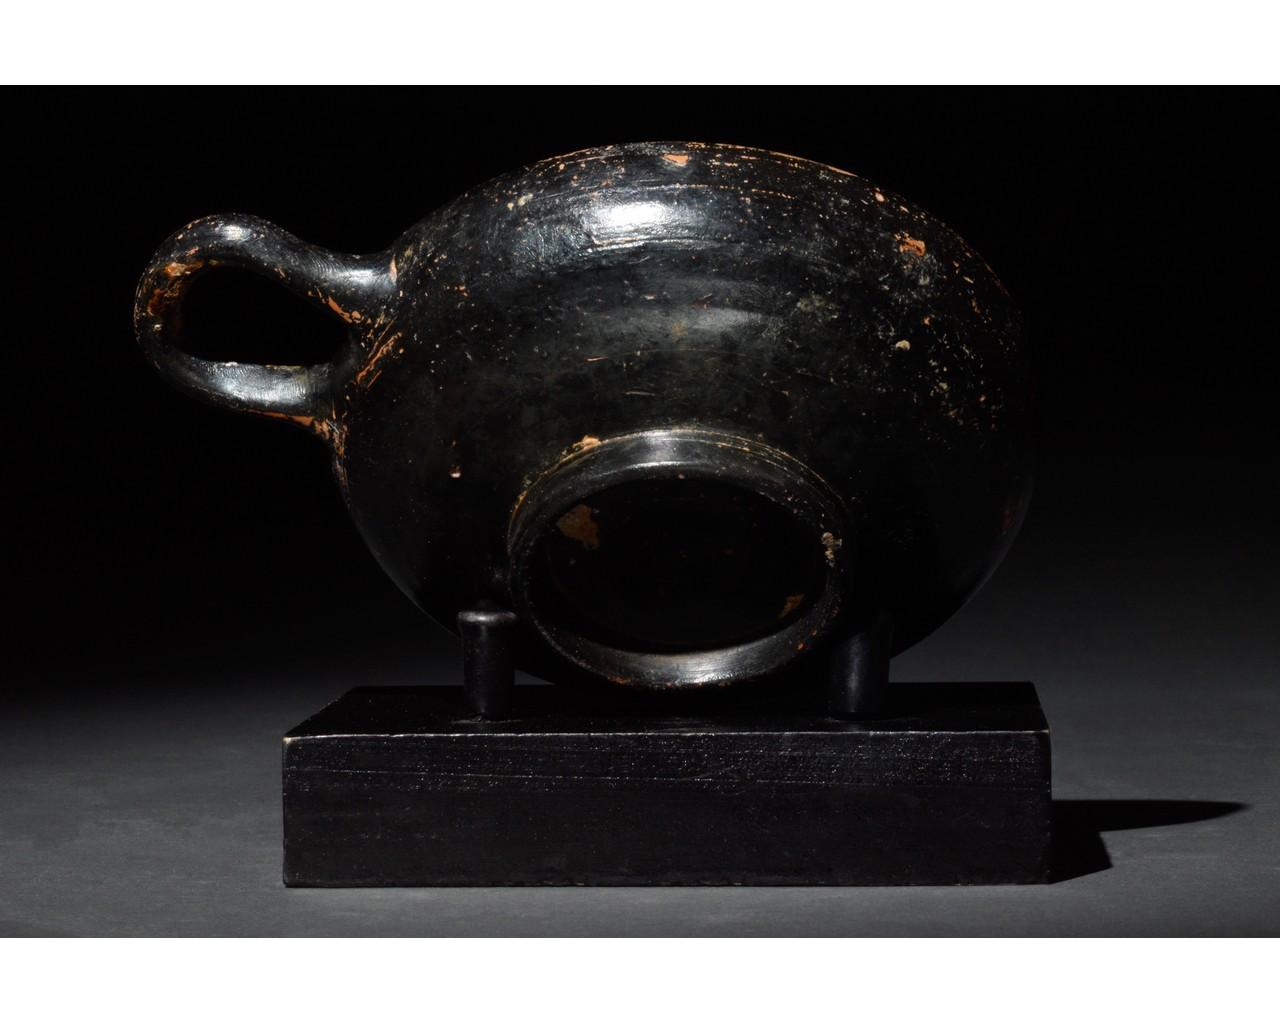 GREEK APULIAN CUP - Image 3 of 5